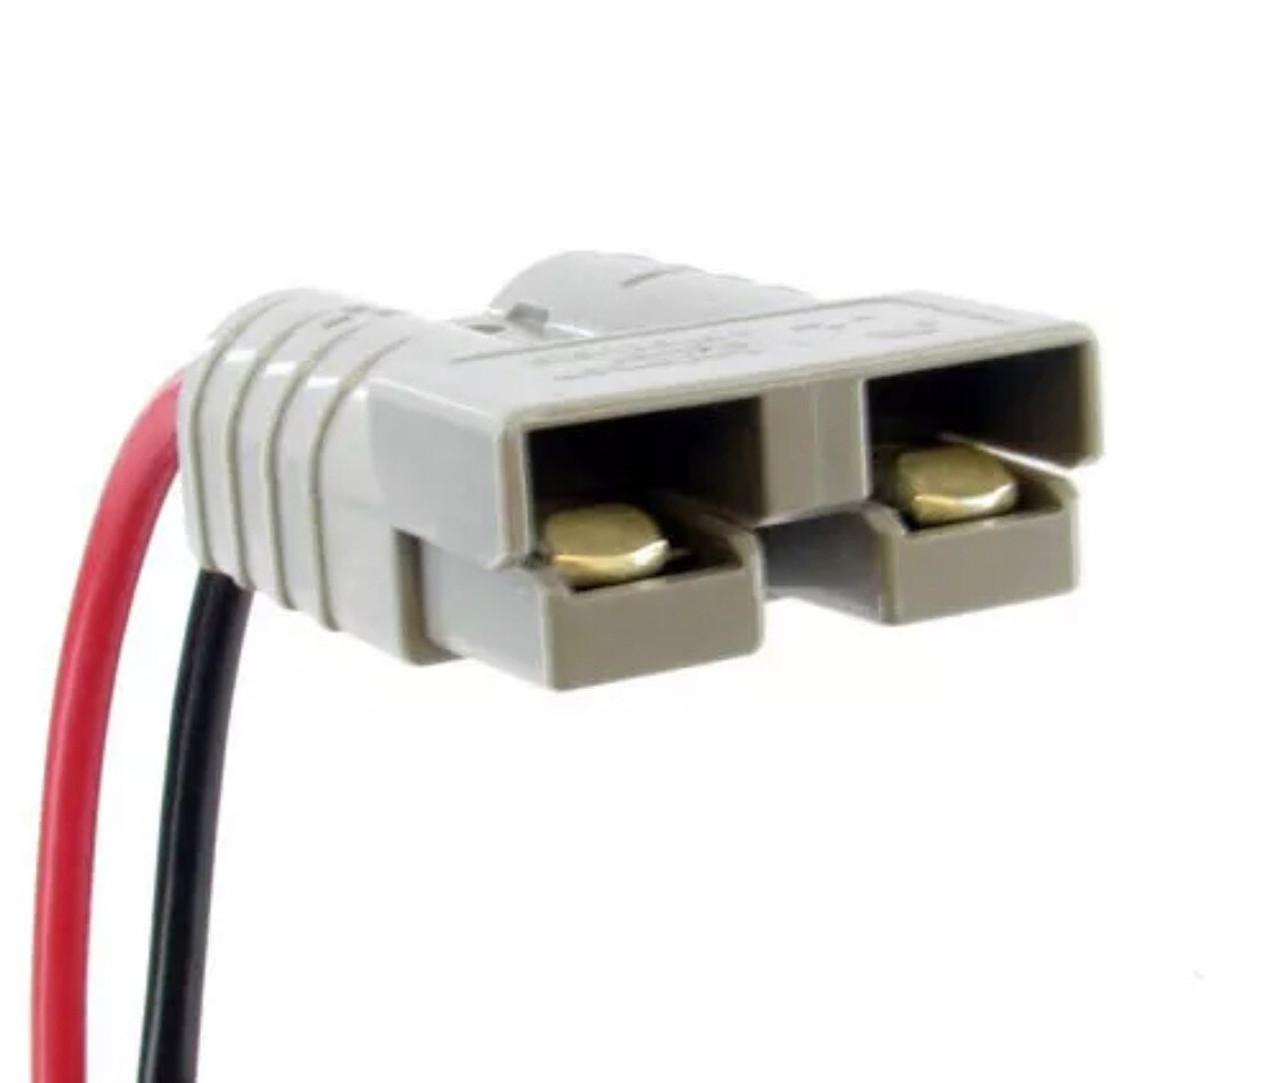 Raion Power RBC7 Wiring Harness Connector For APC SU1400 UPS Unit